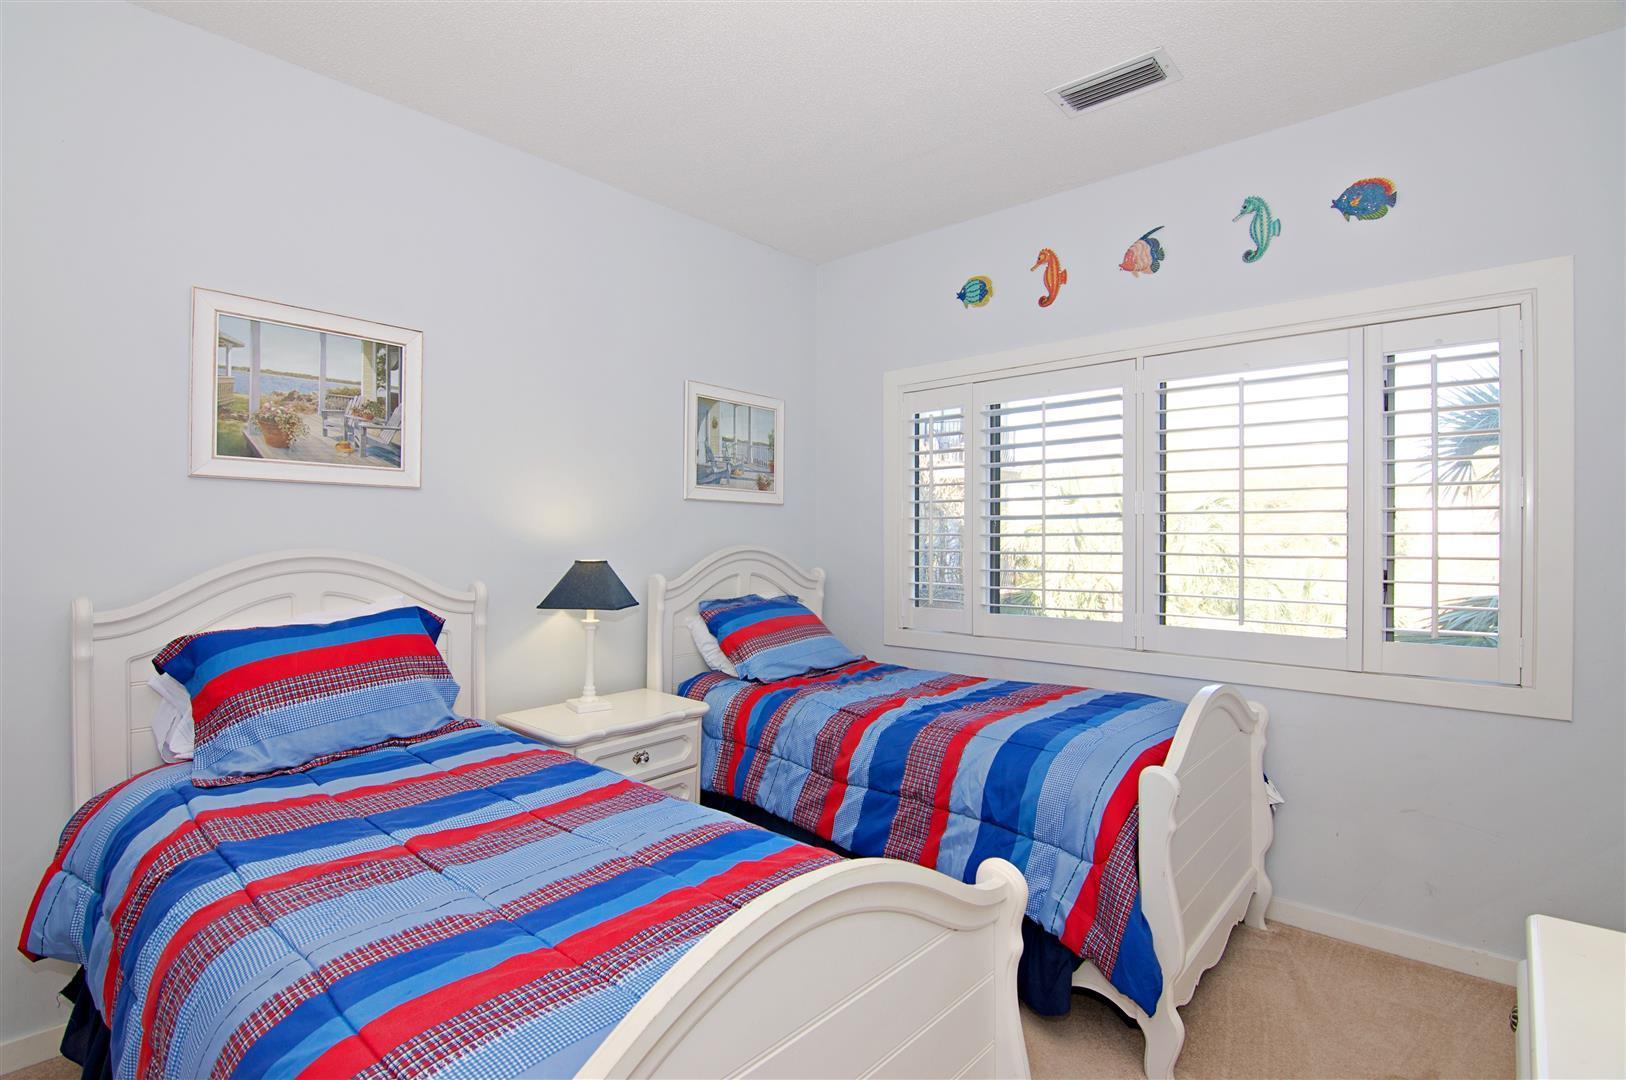 Seabrook Island Homes For Sale - 3020 Ocean Winds, Seabrook Island, SC - 20